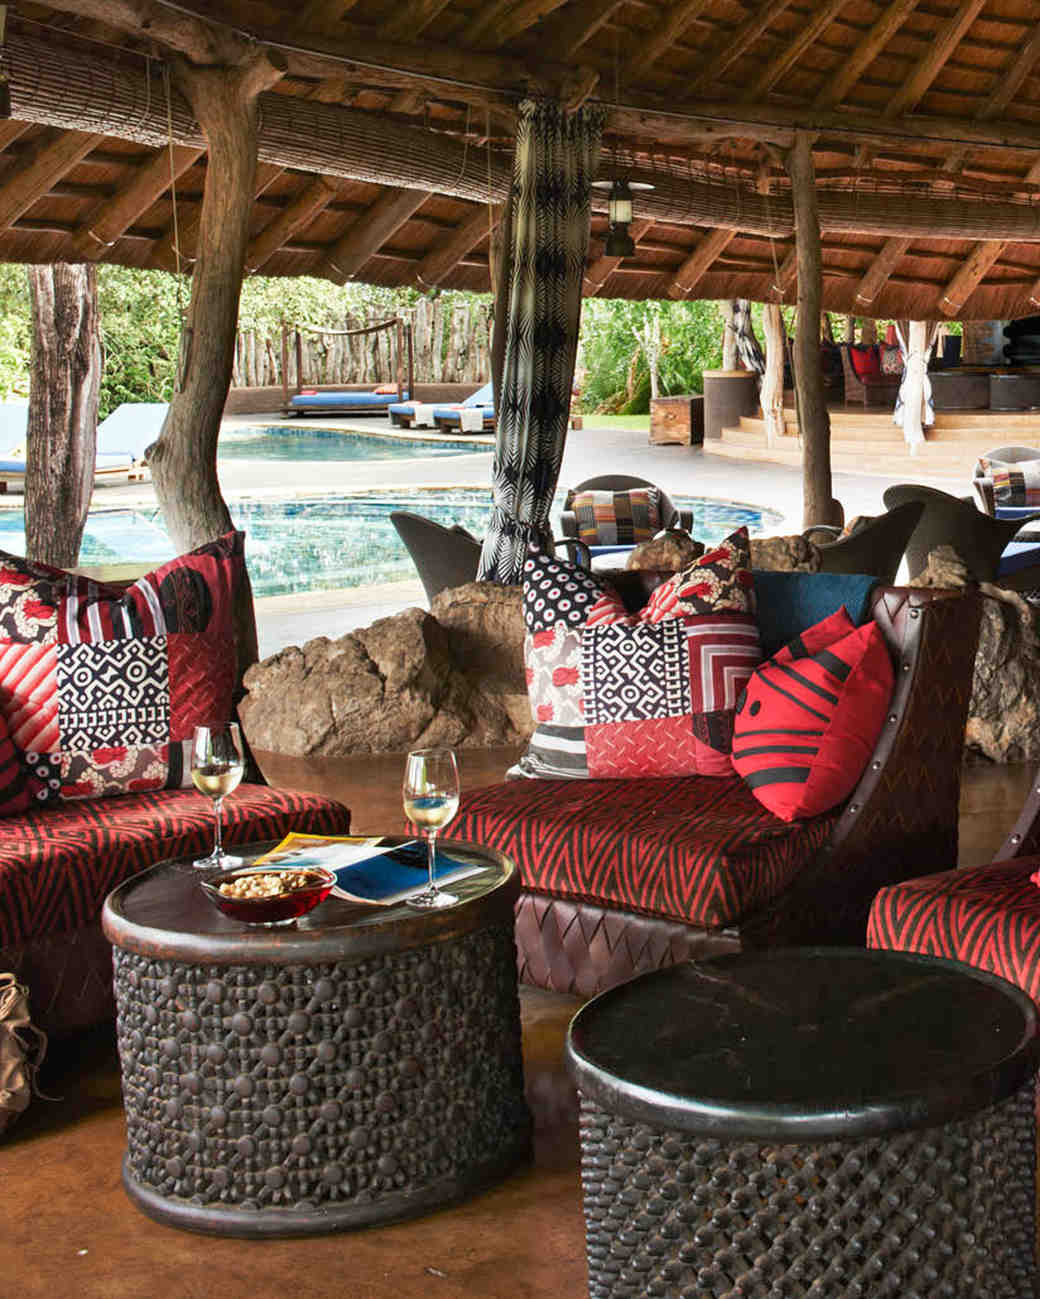 singita-pamushana-lodge-africa-wedding-venue-welcome-cocktails-0815.jpg